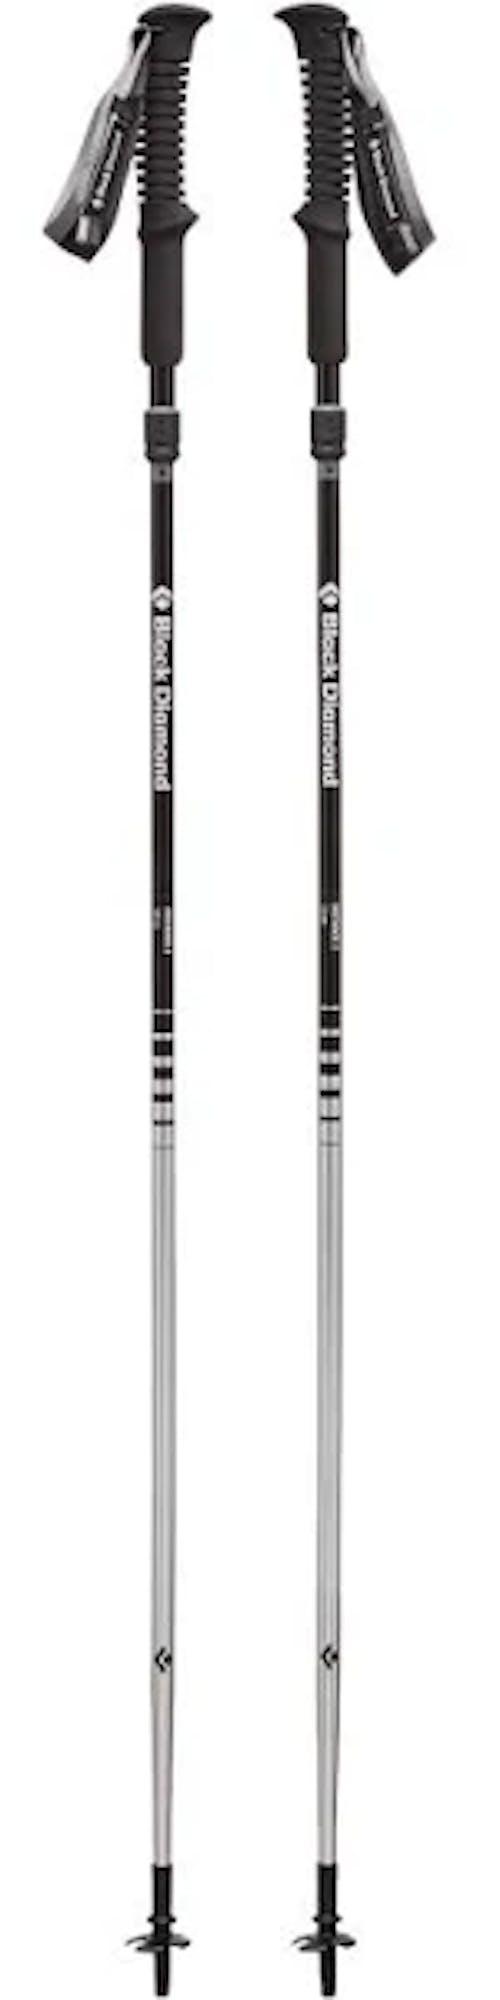 Black Diamond Distance Z Trekking Poles 120 cm